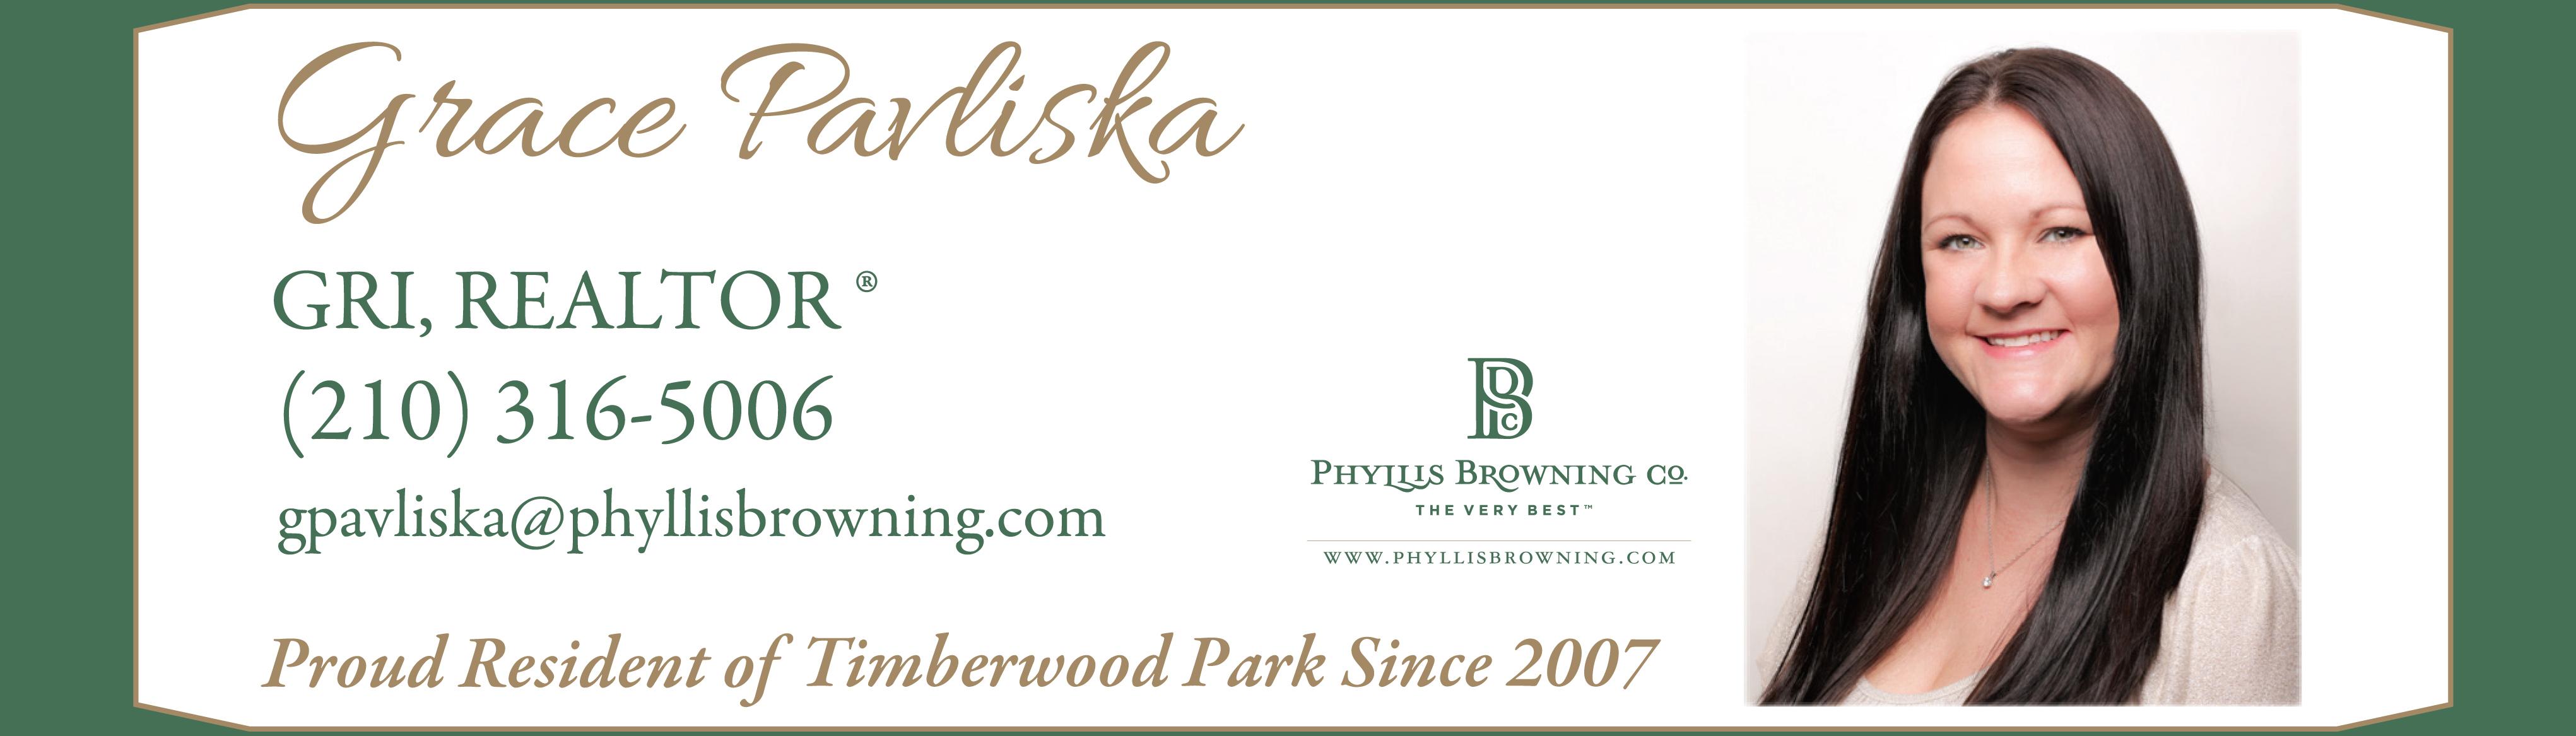 http://www.neighborhoodnews.com/wp-content/uploads/2016/09/Phyllis-Browning-Pavliska_Oct16_Web-Banner.jpg